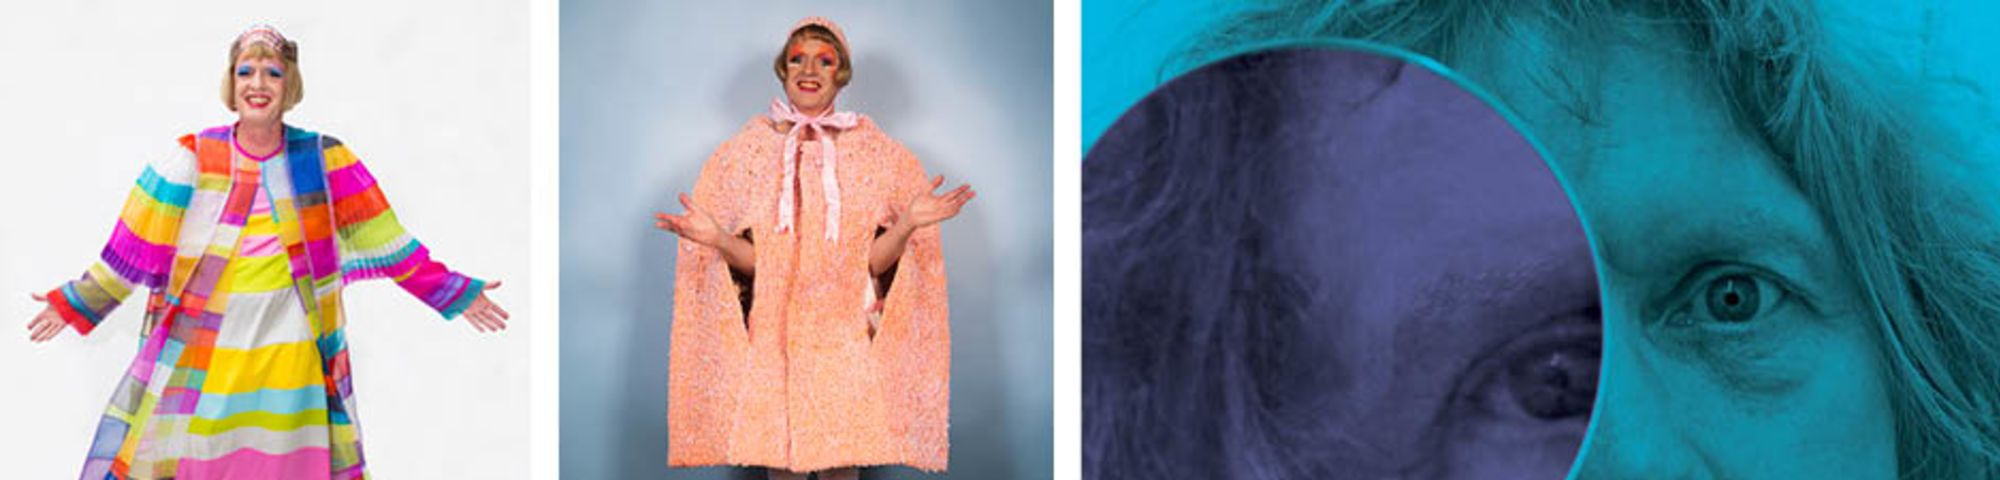 Grayson's Robes composite image